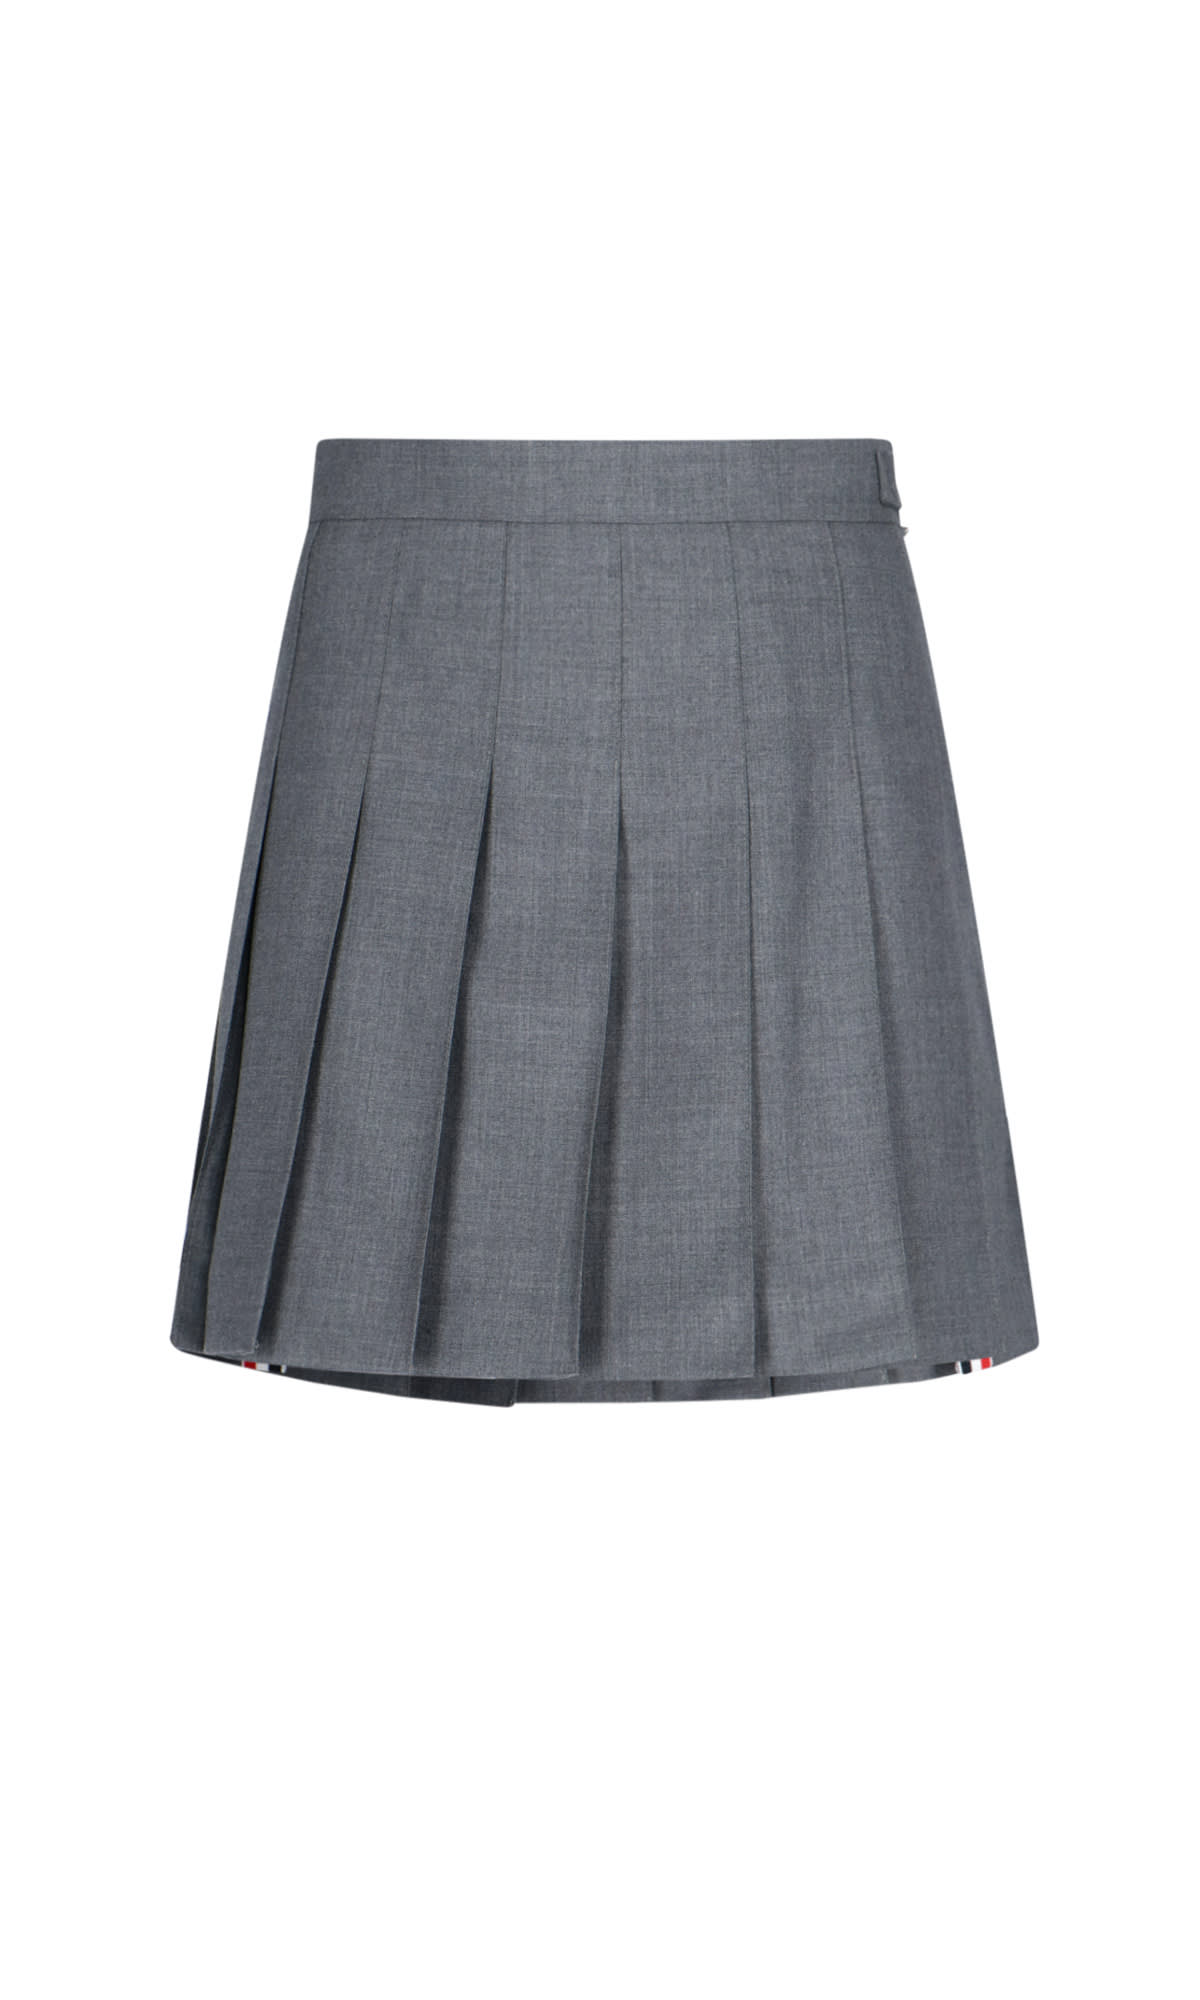 Thom Browne Clothing SKIRT